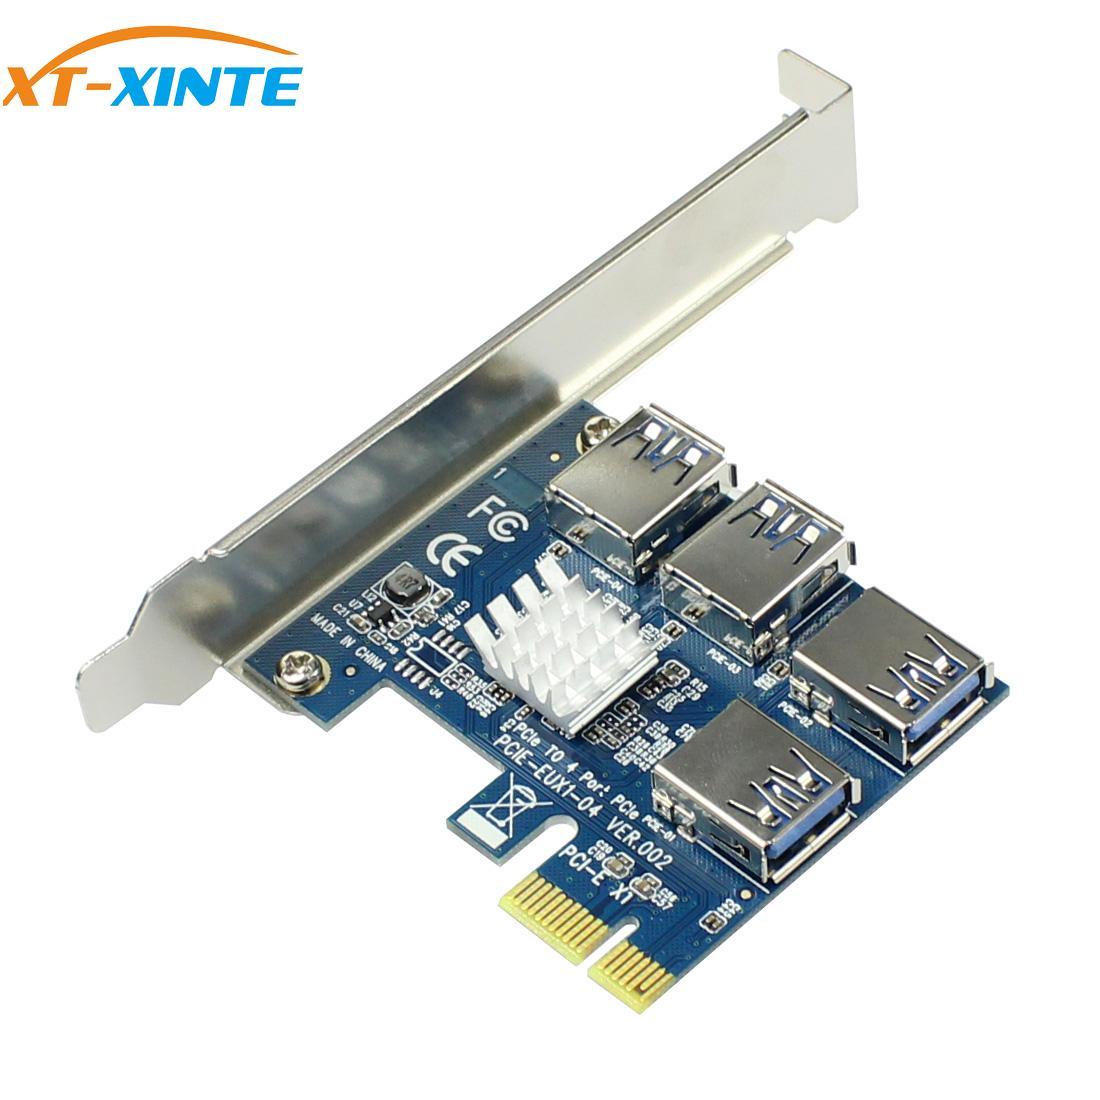 PCIe 1 to 4 PCI-express 16X slots Riser Card PCI-E 1X to External 4 PCI-e USB 3.0 Adapter Multiplier